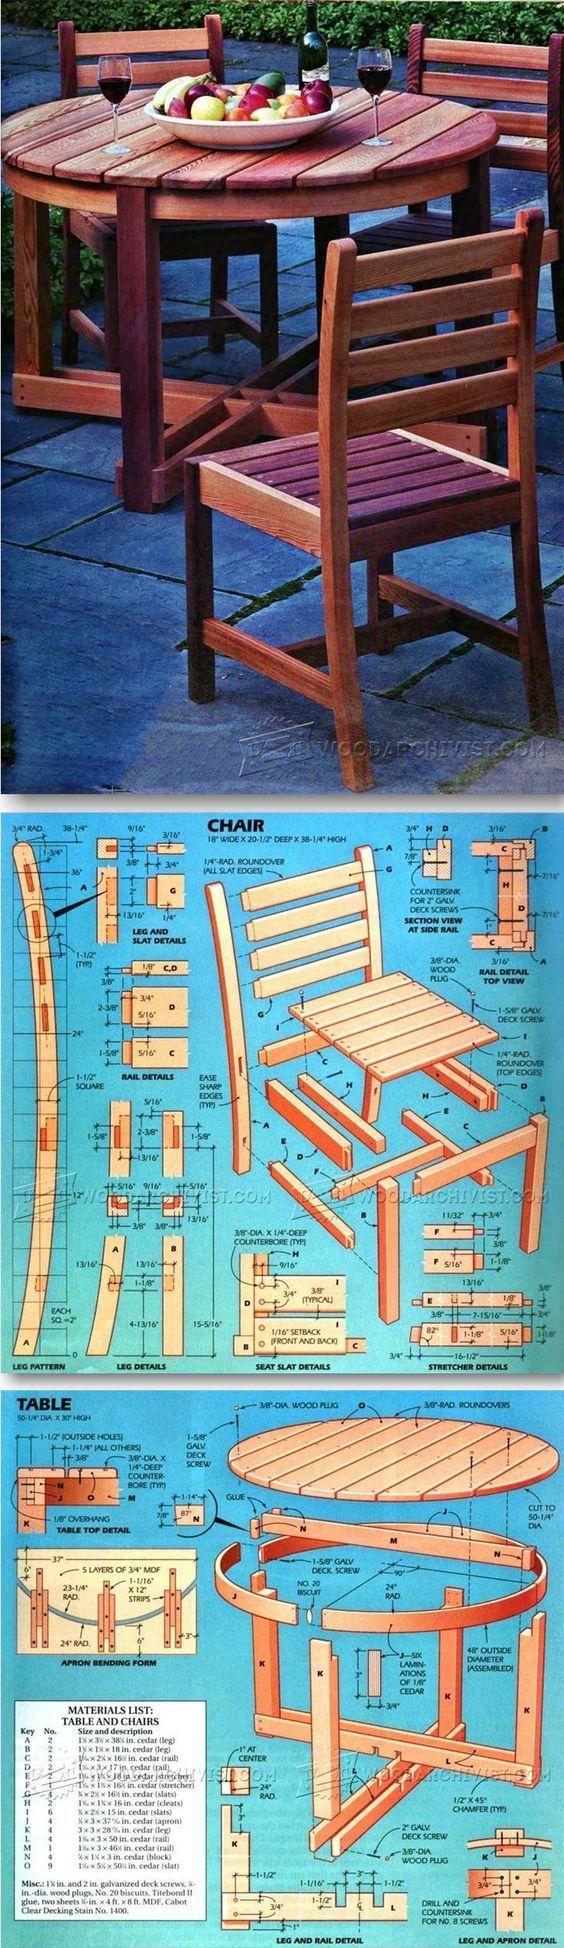 Открытый стол и стул планы - Уличная мебель Планы & Проекты   WoodArchivist.com: